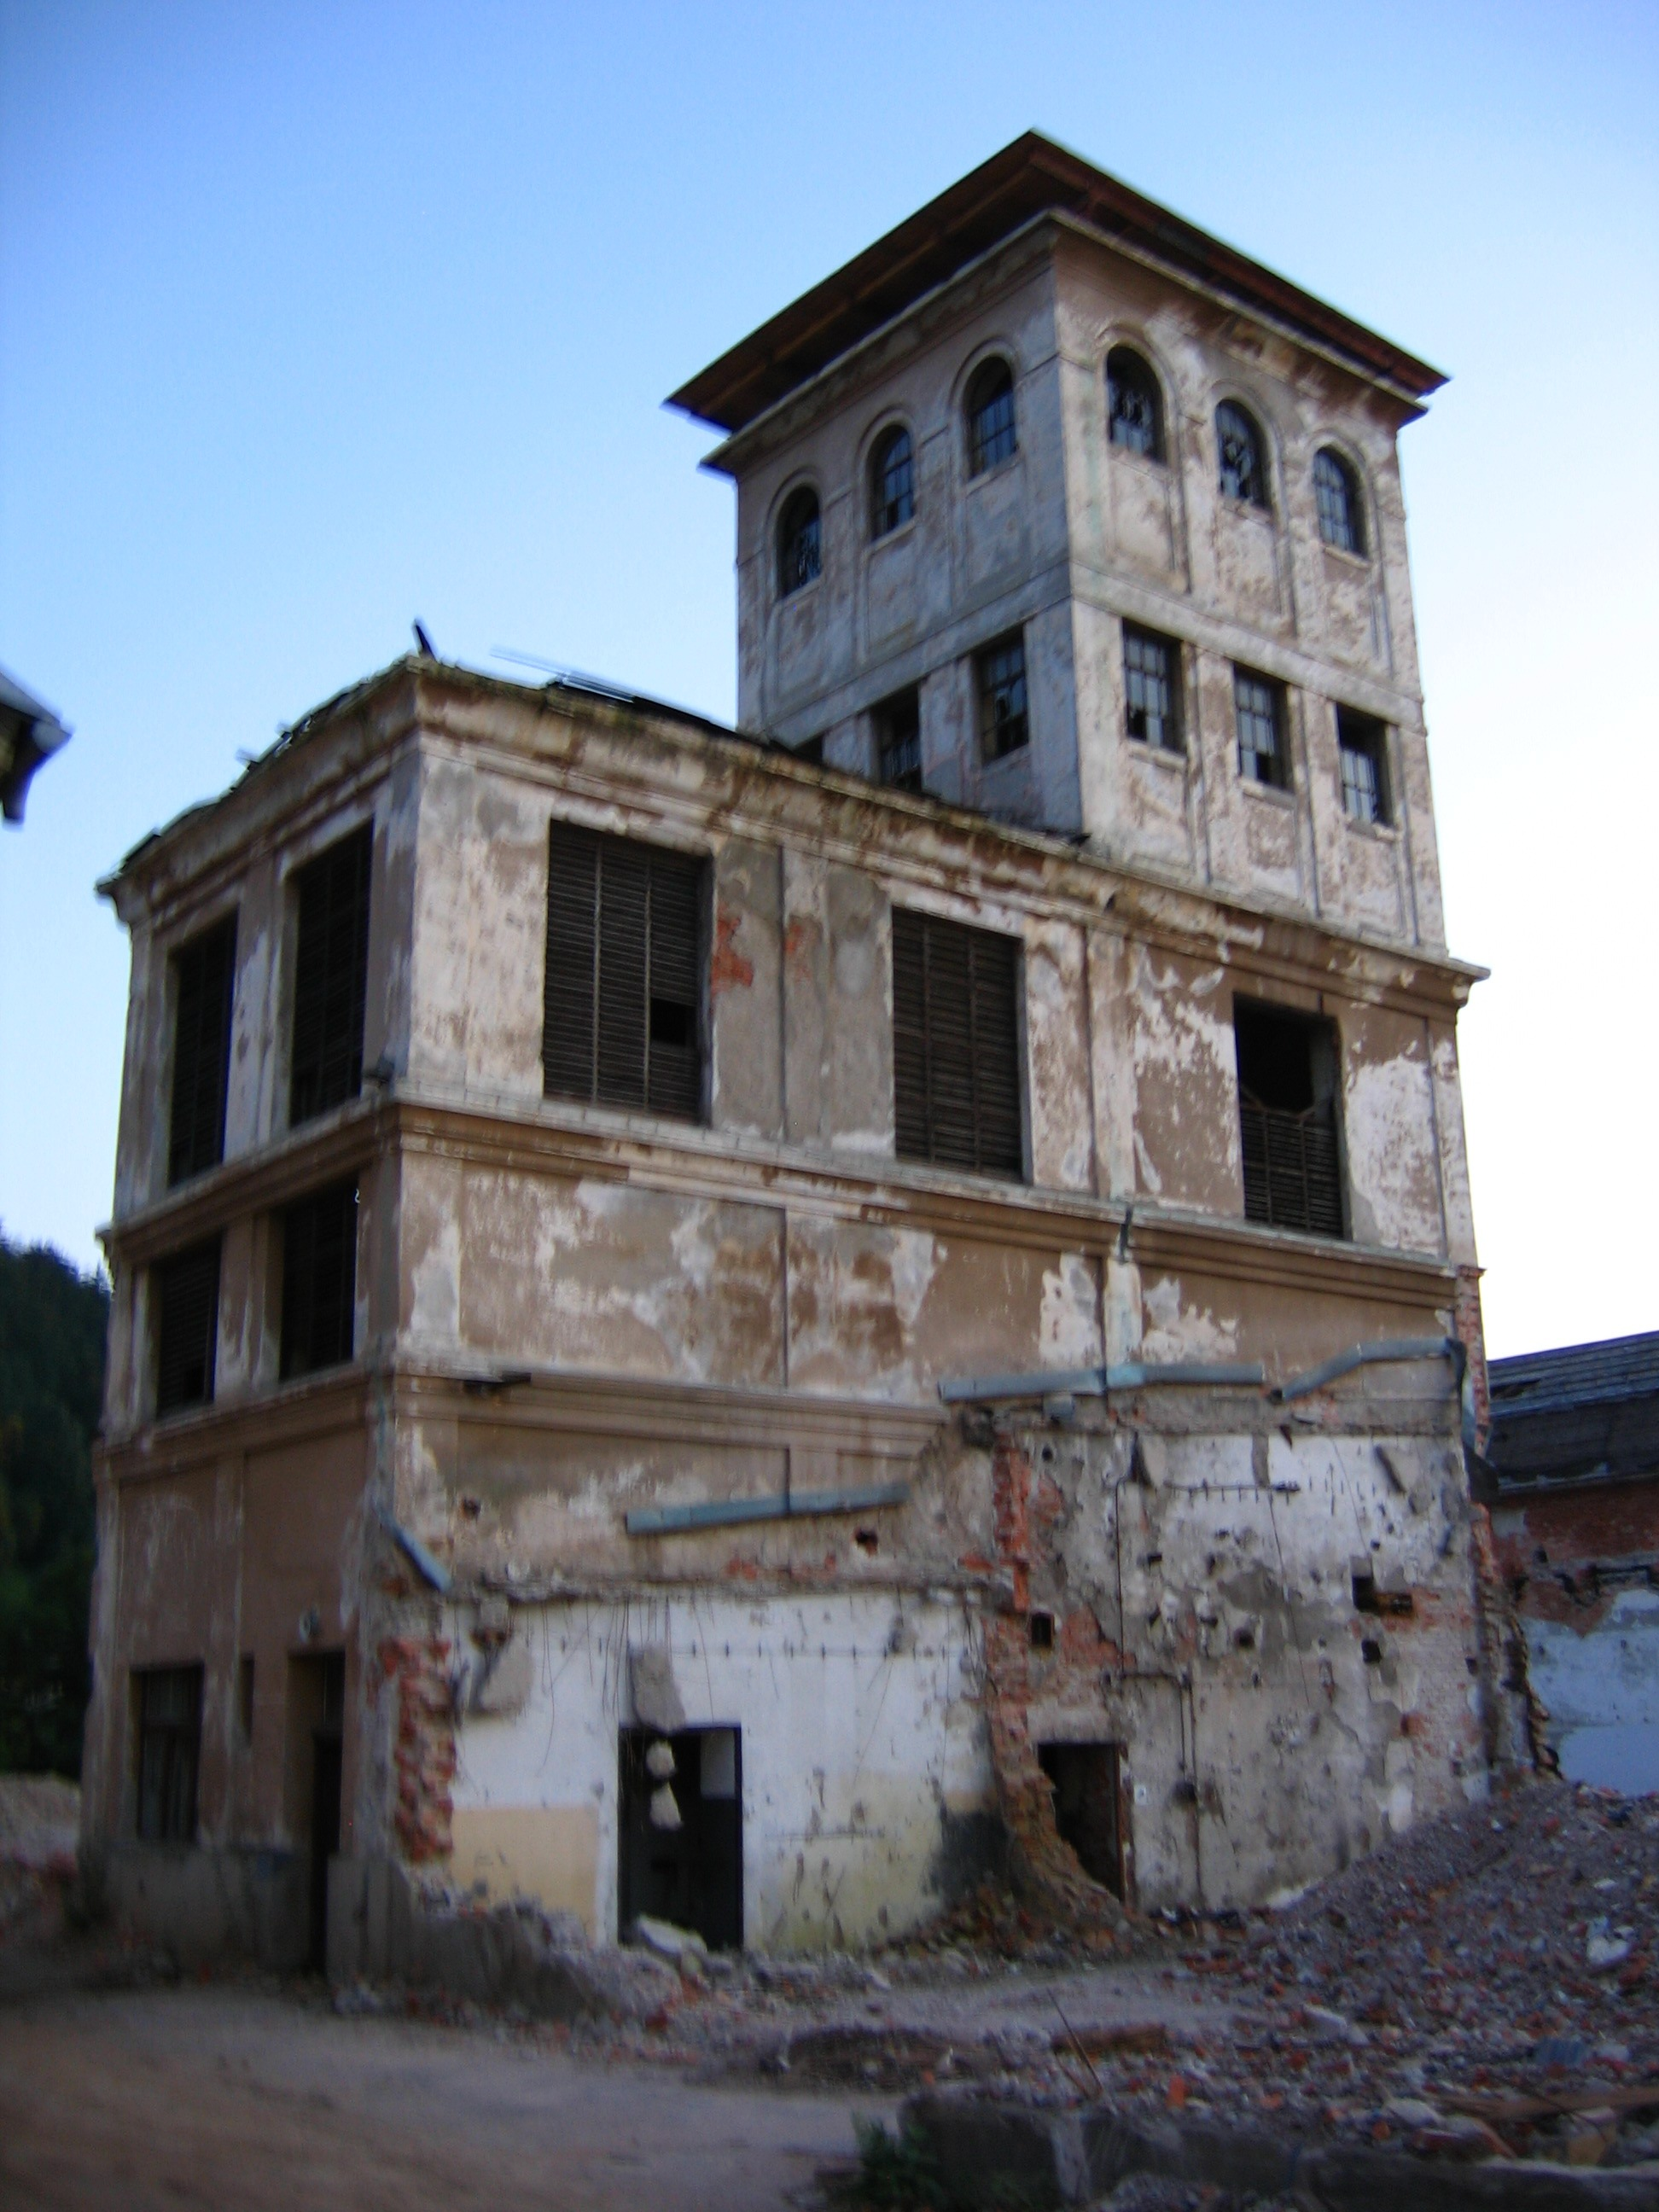 Image - Abandoned building the little hobo boy.jpg | Creepypasta ...